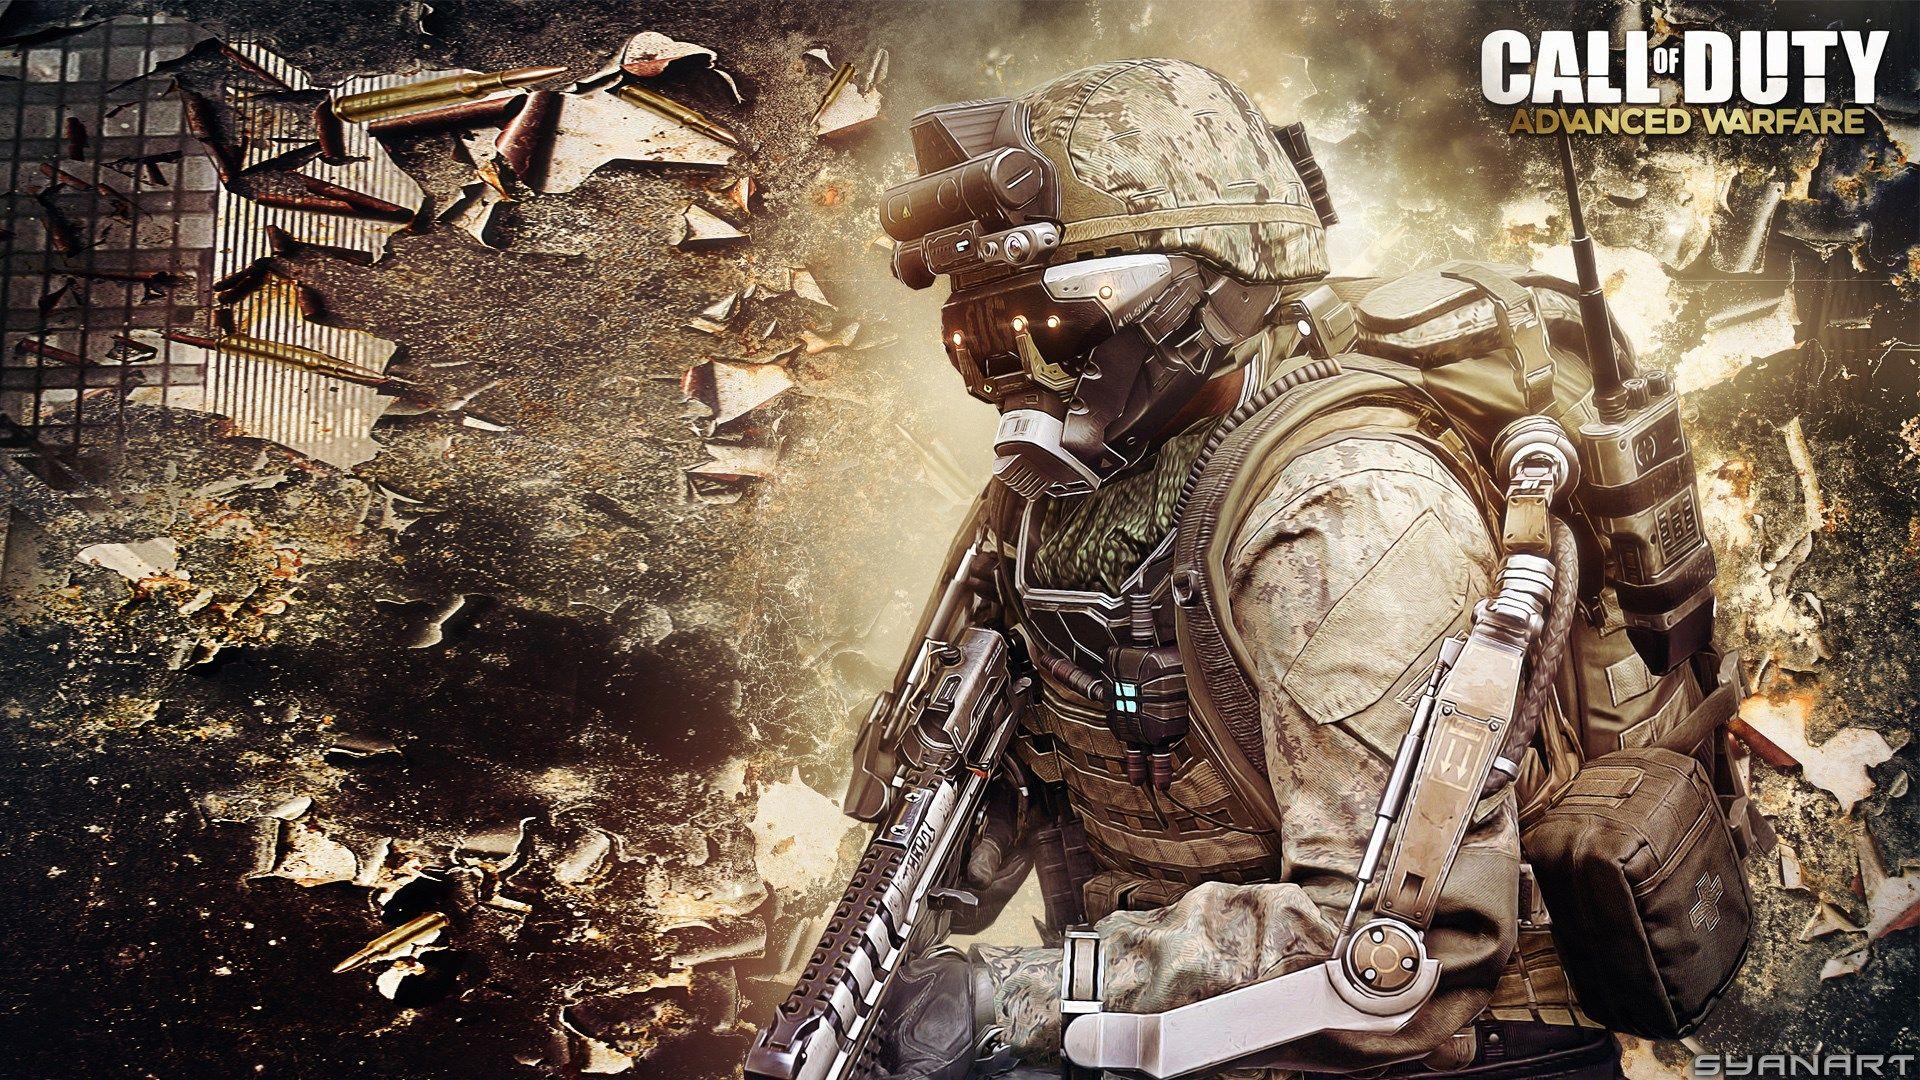 modern warfare call of duty wallpaper 1920x1080